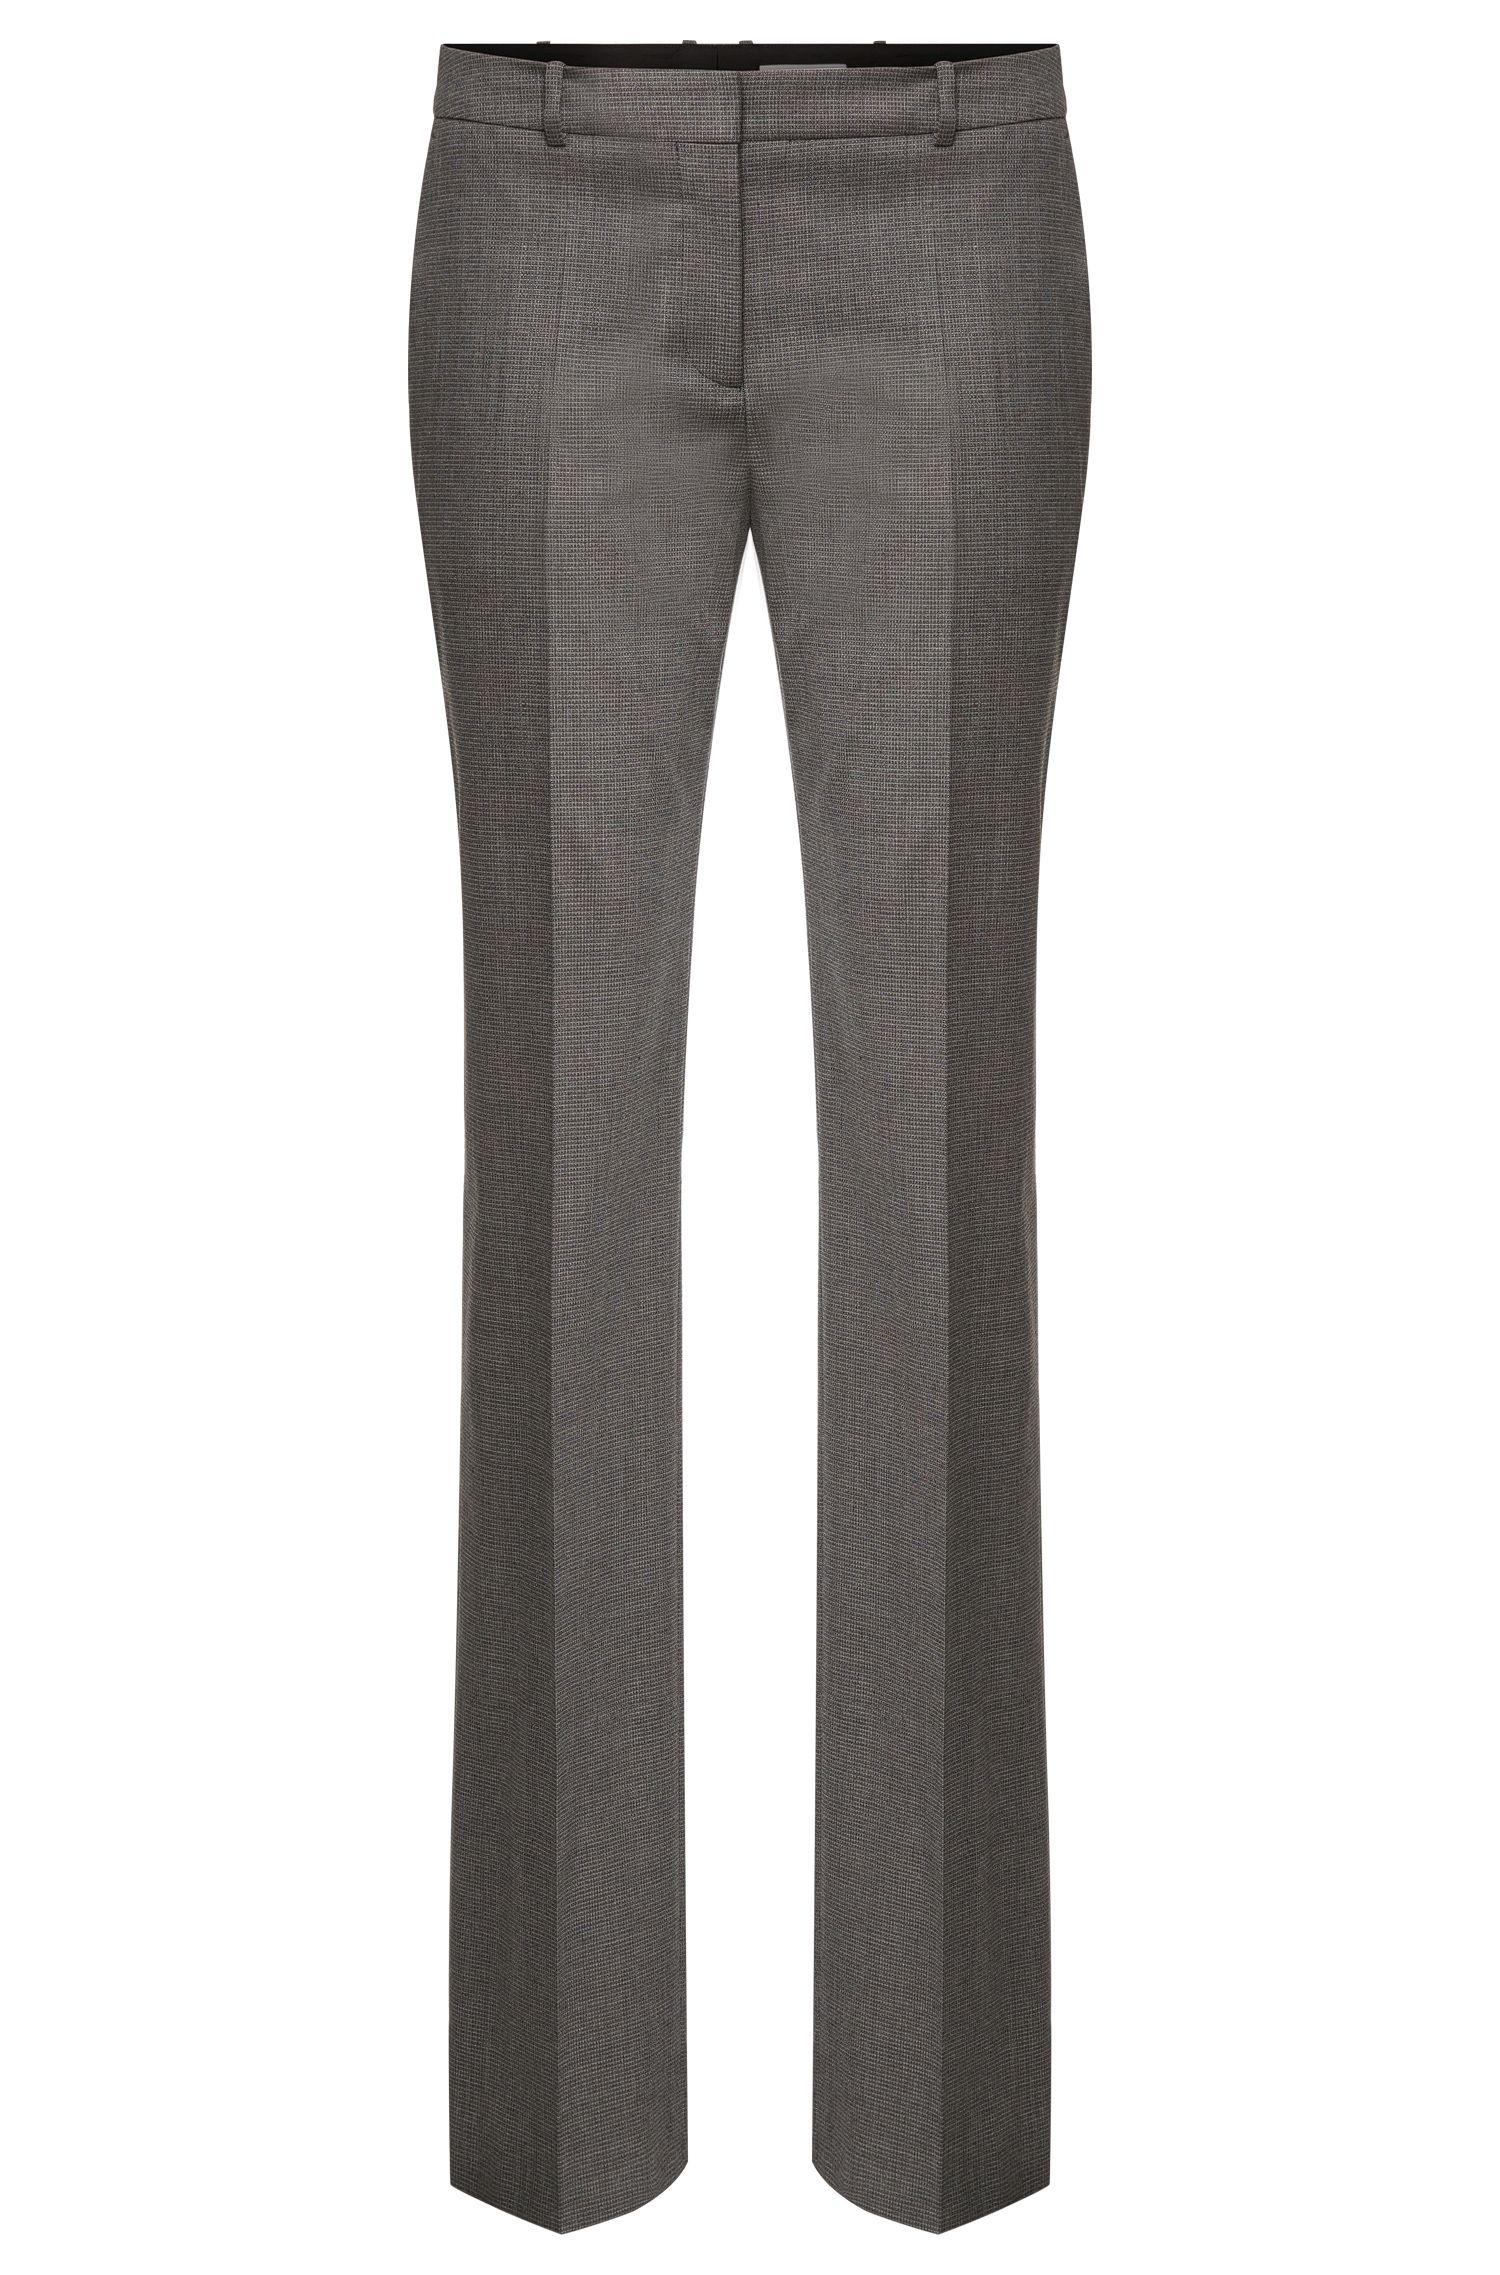 'Tamea' | Stretch Virgin Wool Blend Patterned Dress Pants